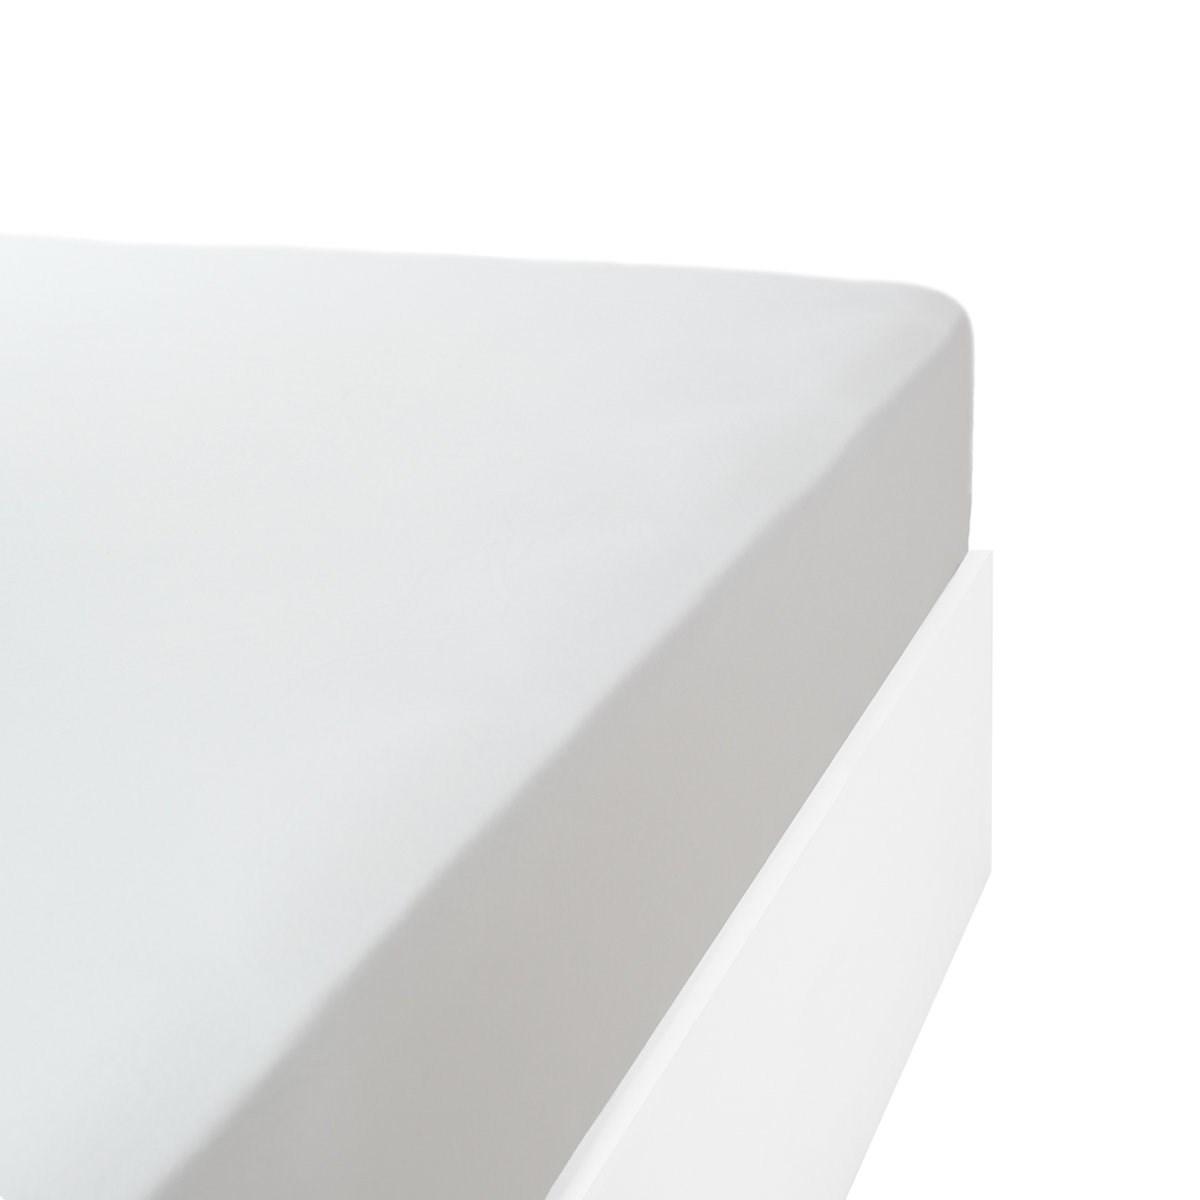 Drap housse jersey extensible en coton blanc 90x190 cm